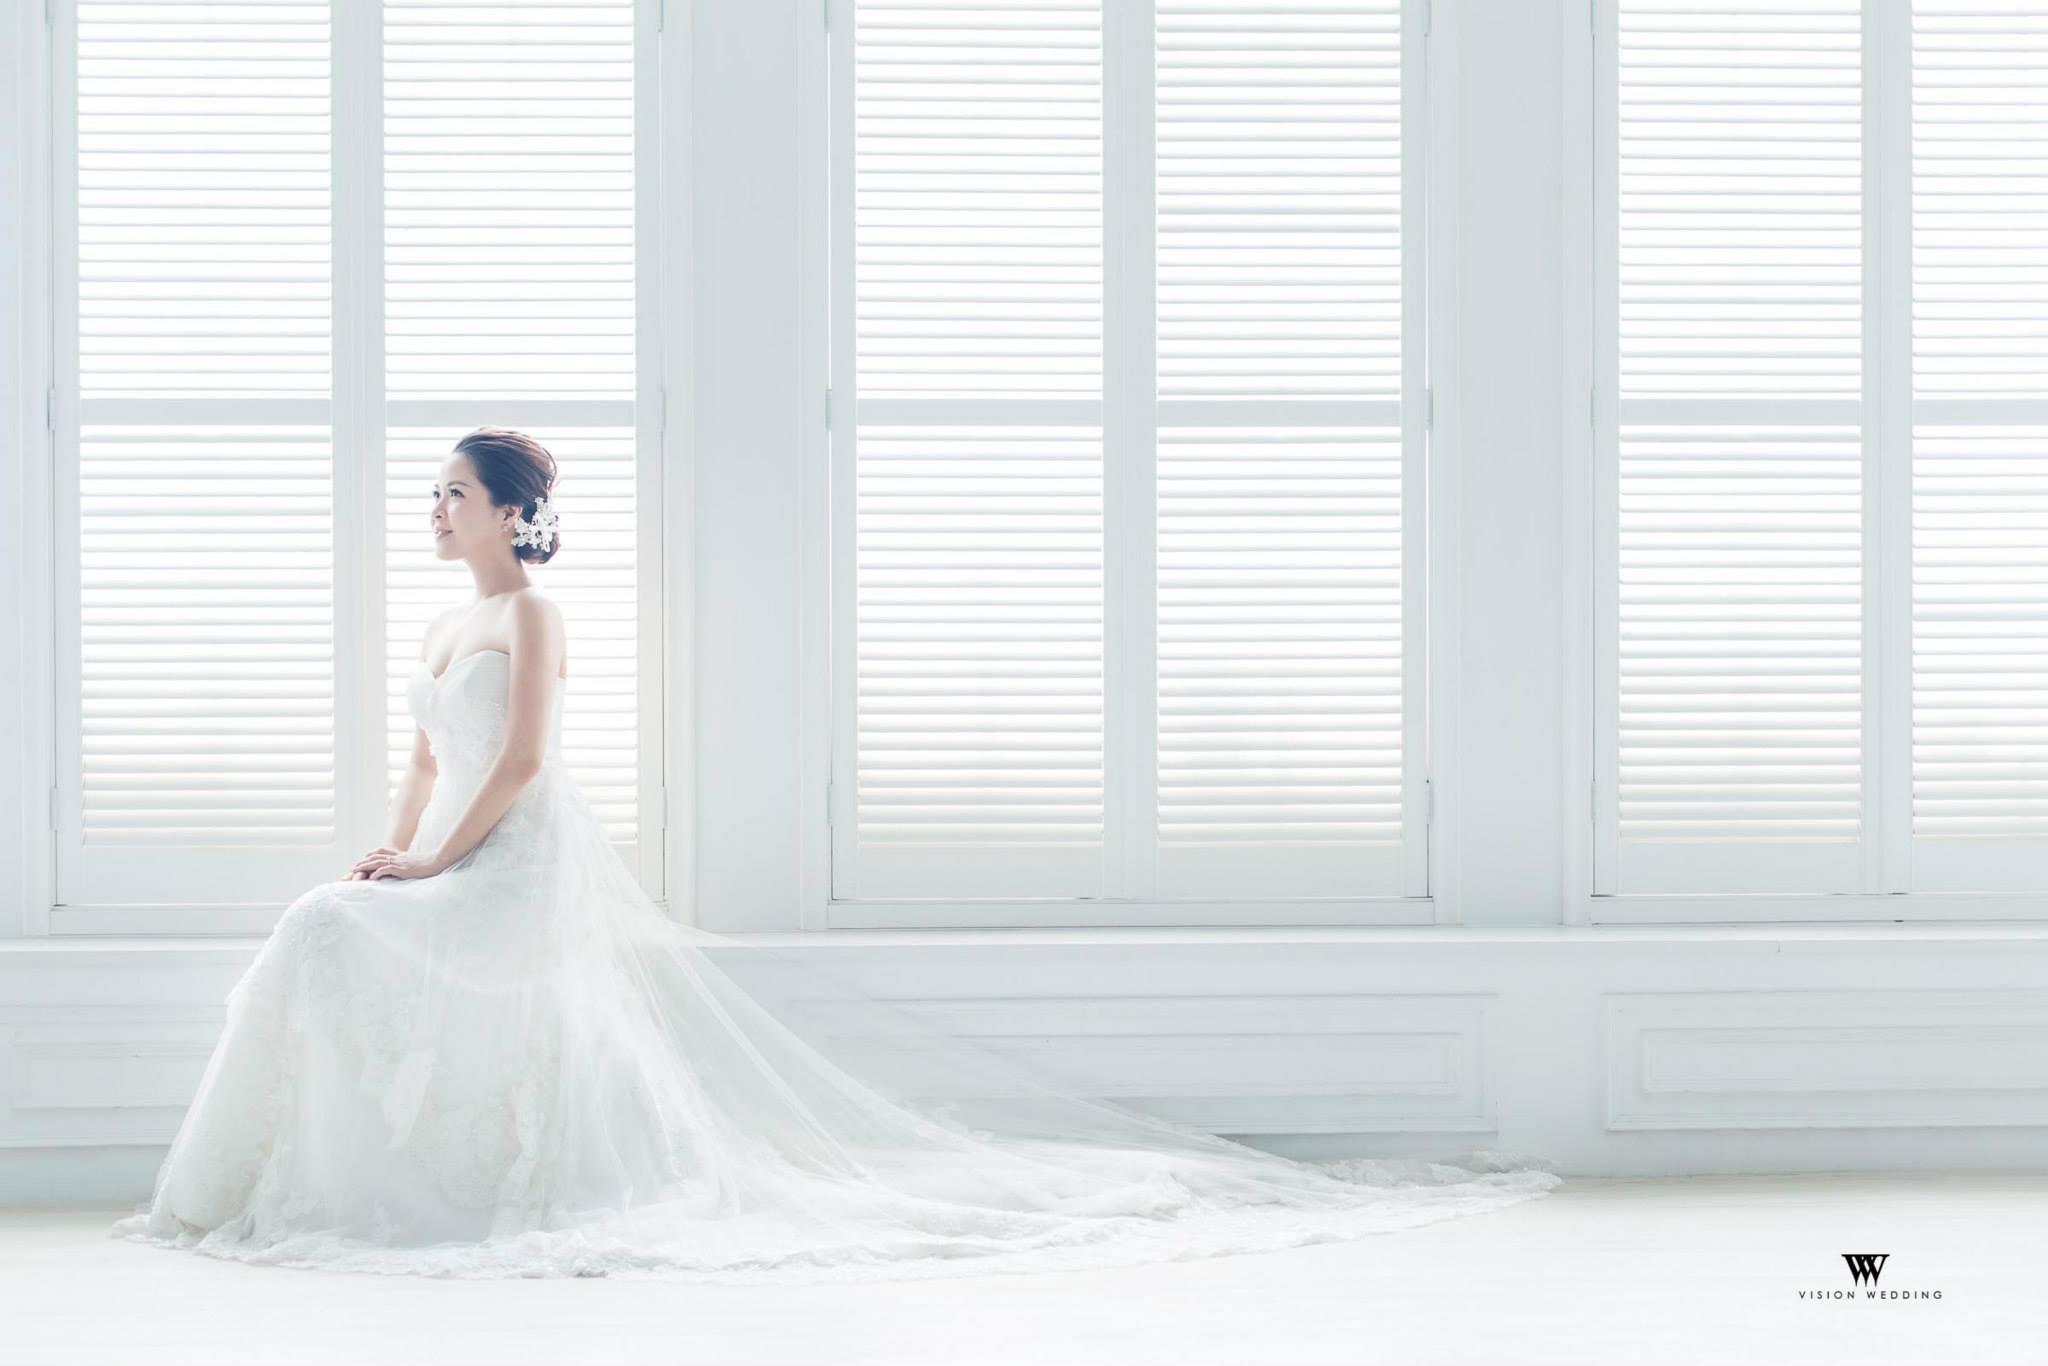 Our beautiful bride to be _Karen.jpg